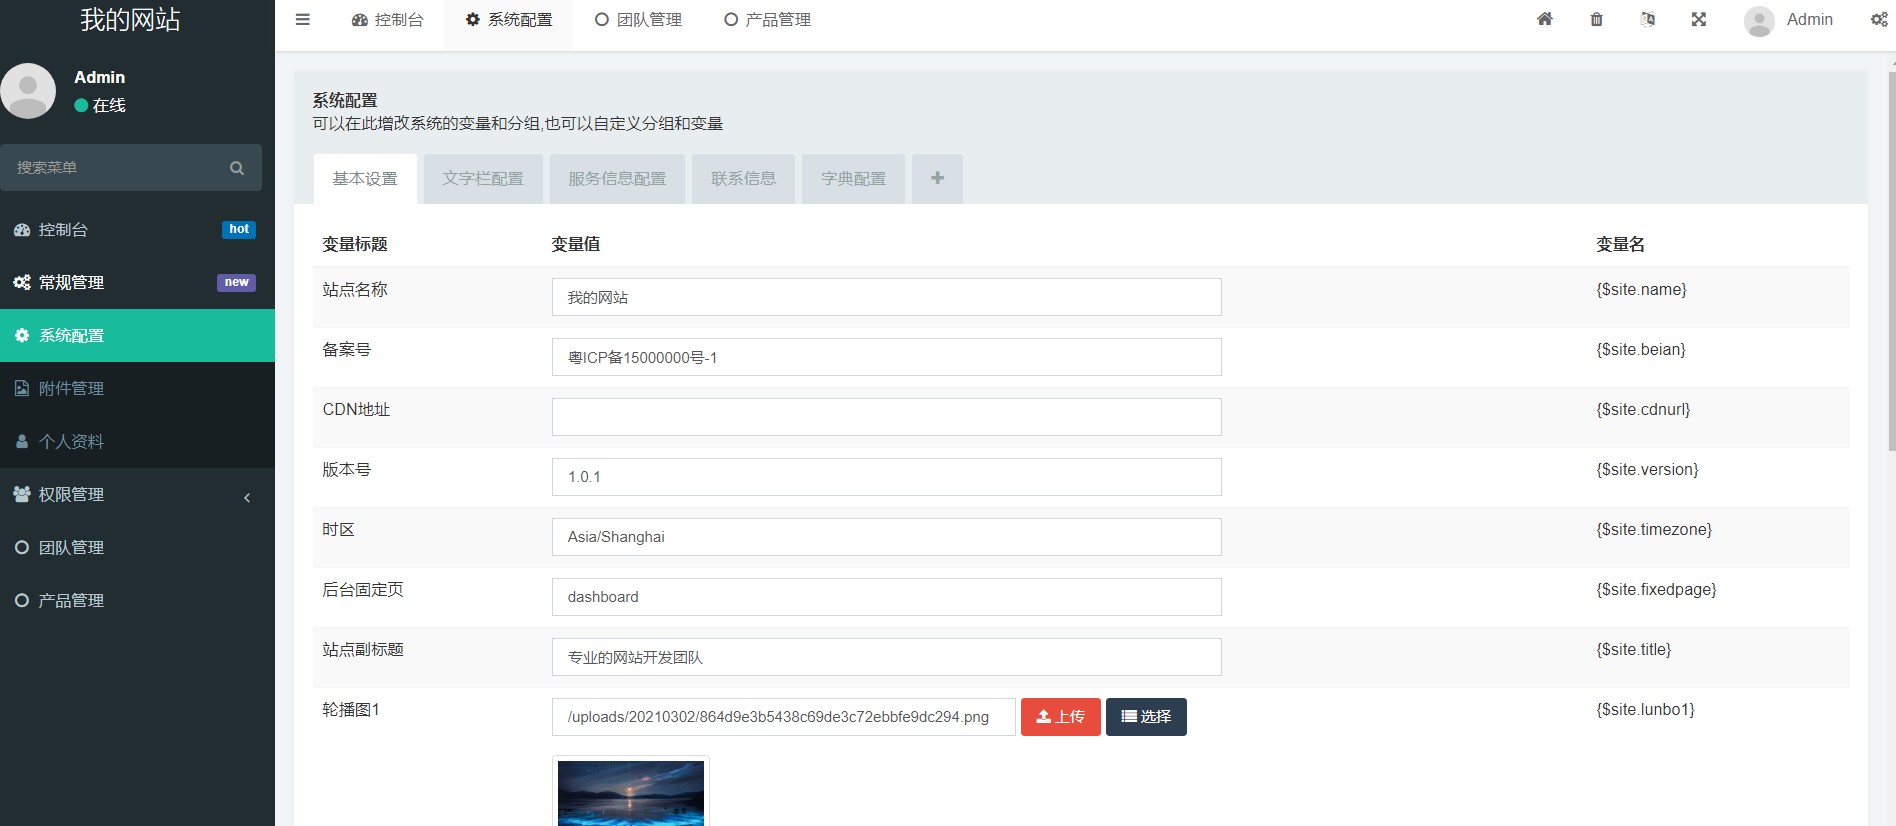 Thinkphp开发的一套简单团队个人主页源码,分享,教程,图文教程,百度,建站,经验,技术,单页,个人主页,第2张